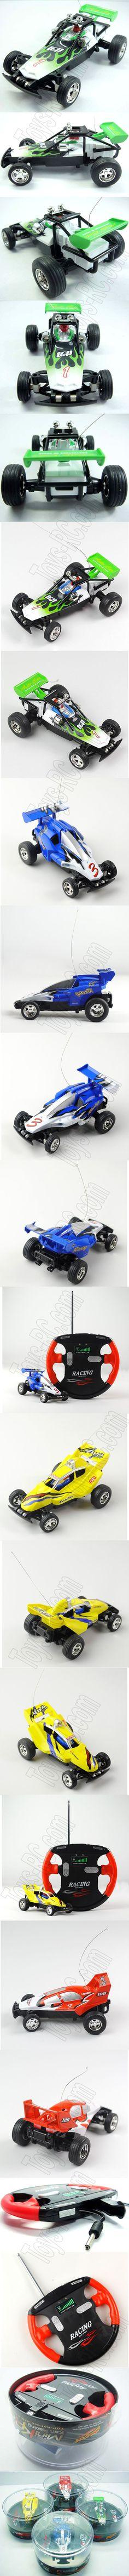 Create Toys 2009D KR2 Electric Mini RC Racing Kart http://www.toys-rc.com/create-toys-2009d-kr2-electric-mini-rc-racing-kart-p-297.html